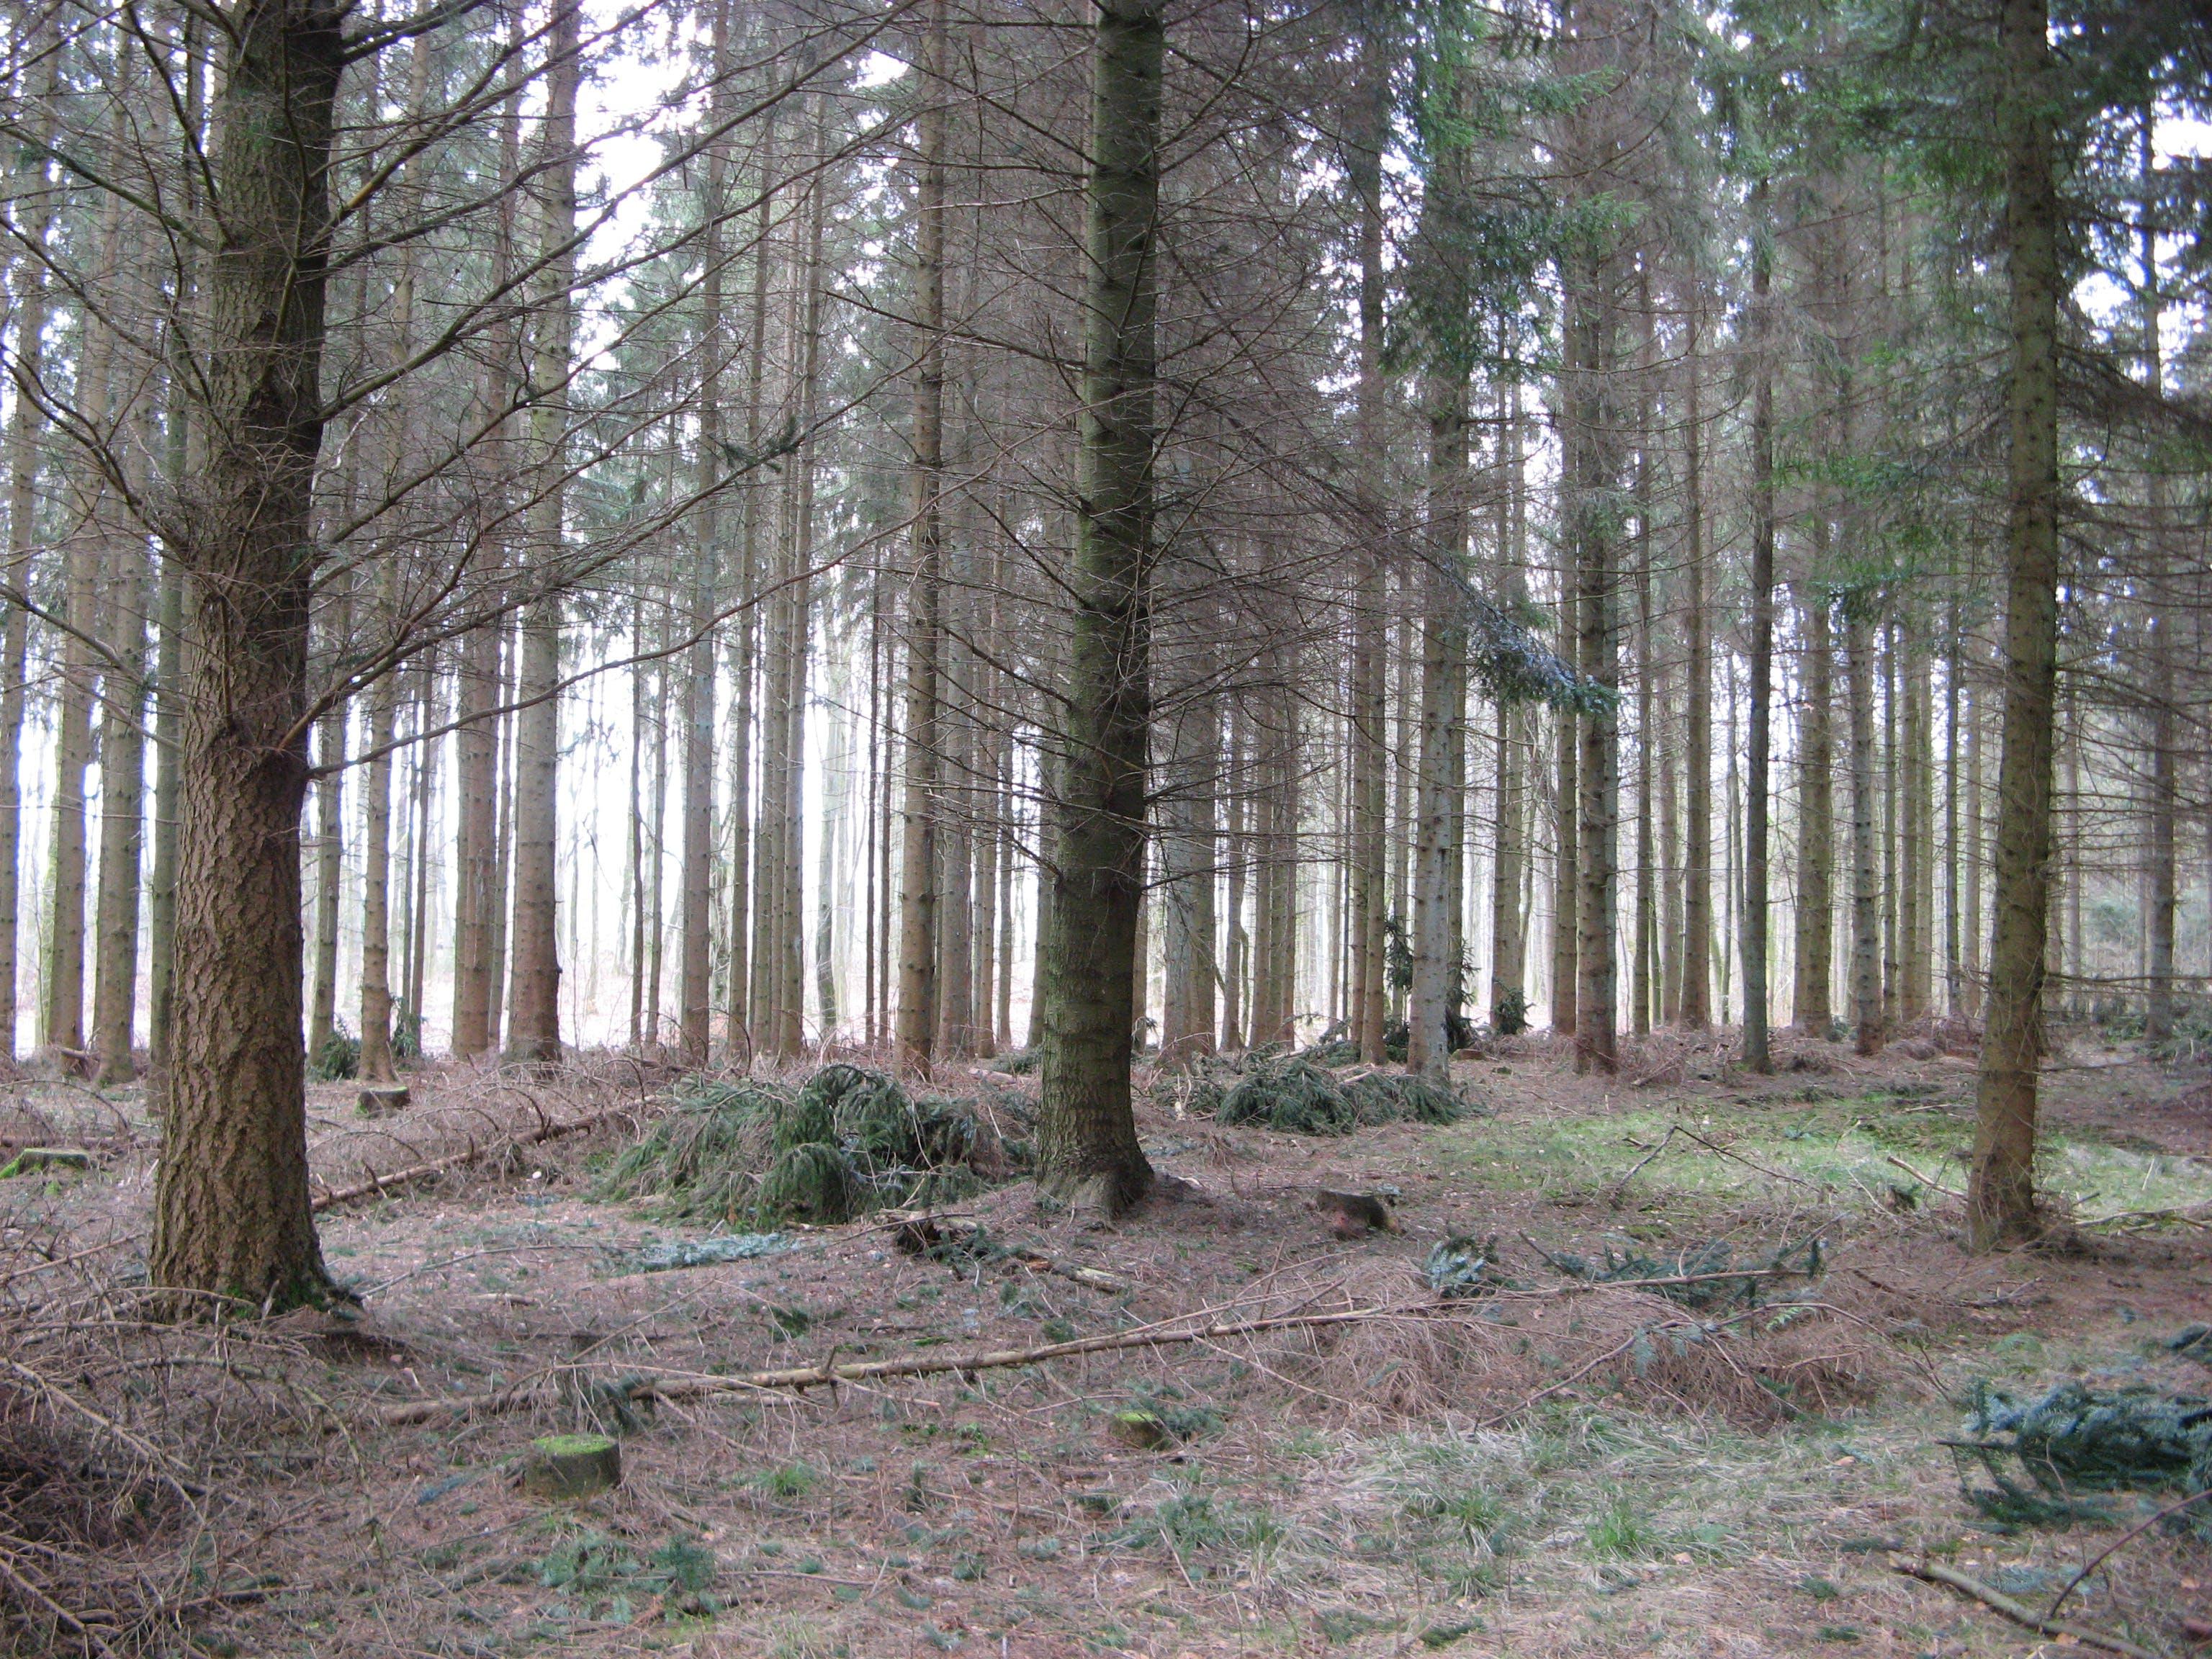 conifers, environment, fir trees